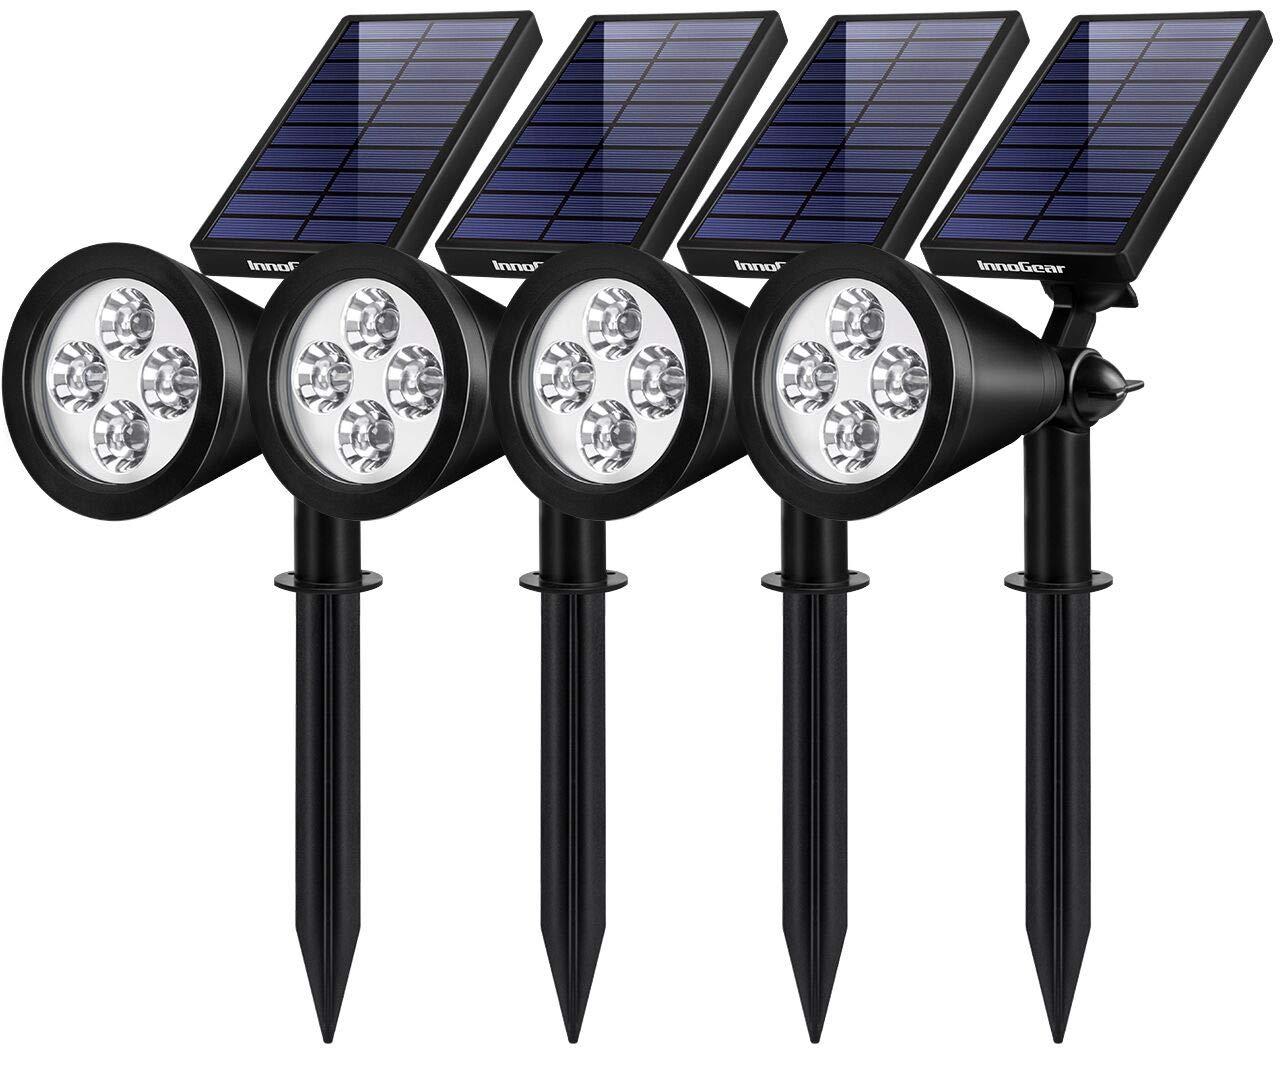 InnoGear Solar Lights – Waterproof Outdoor Landscape Lights